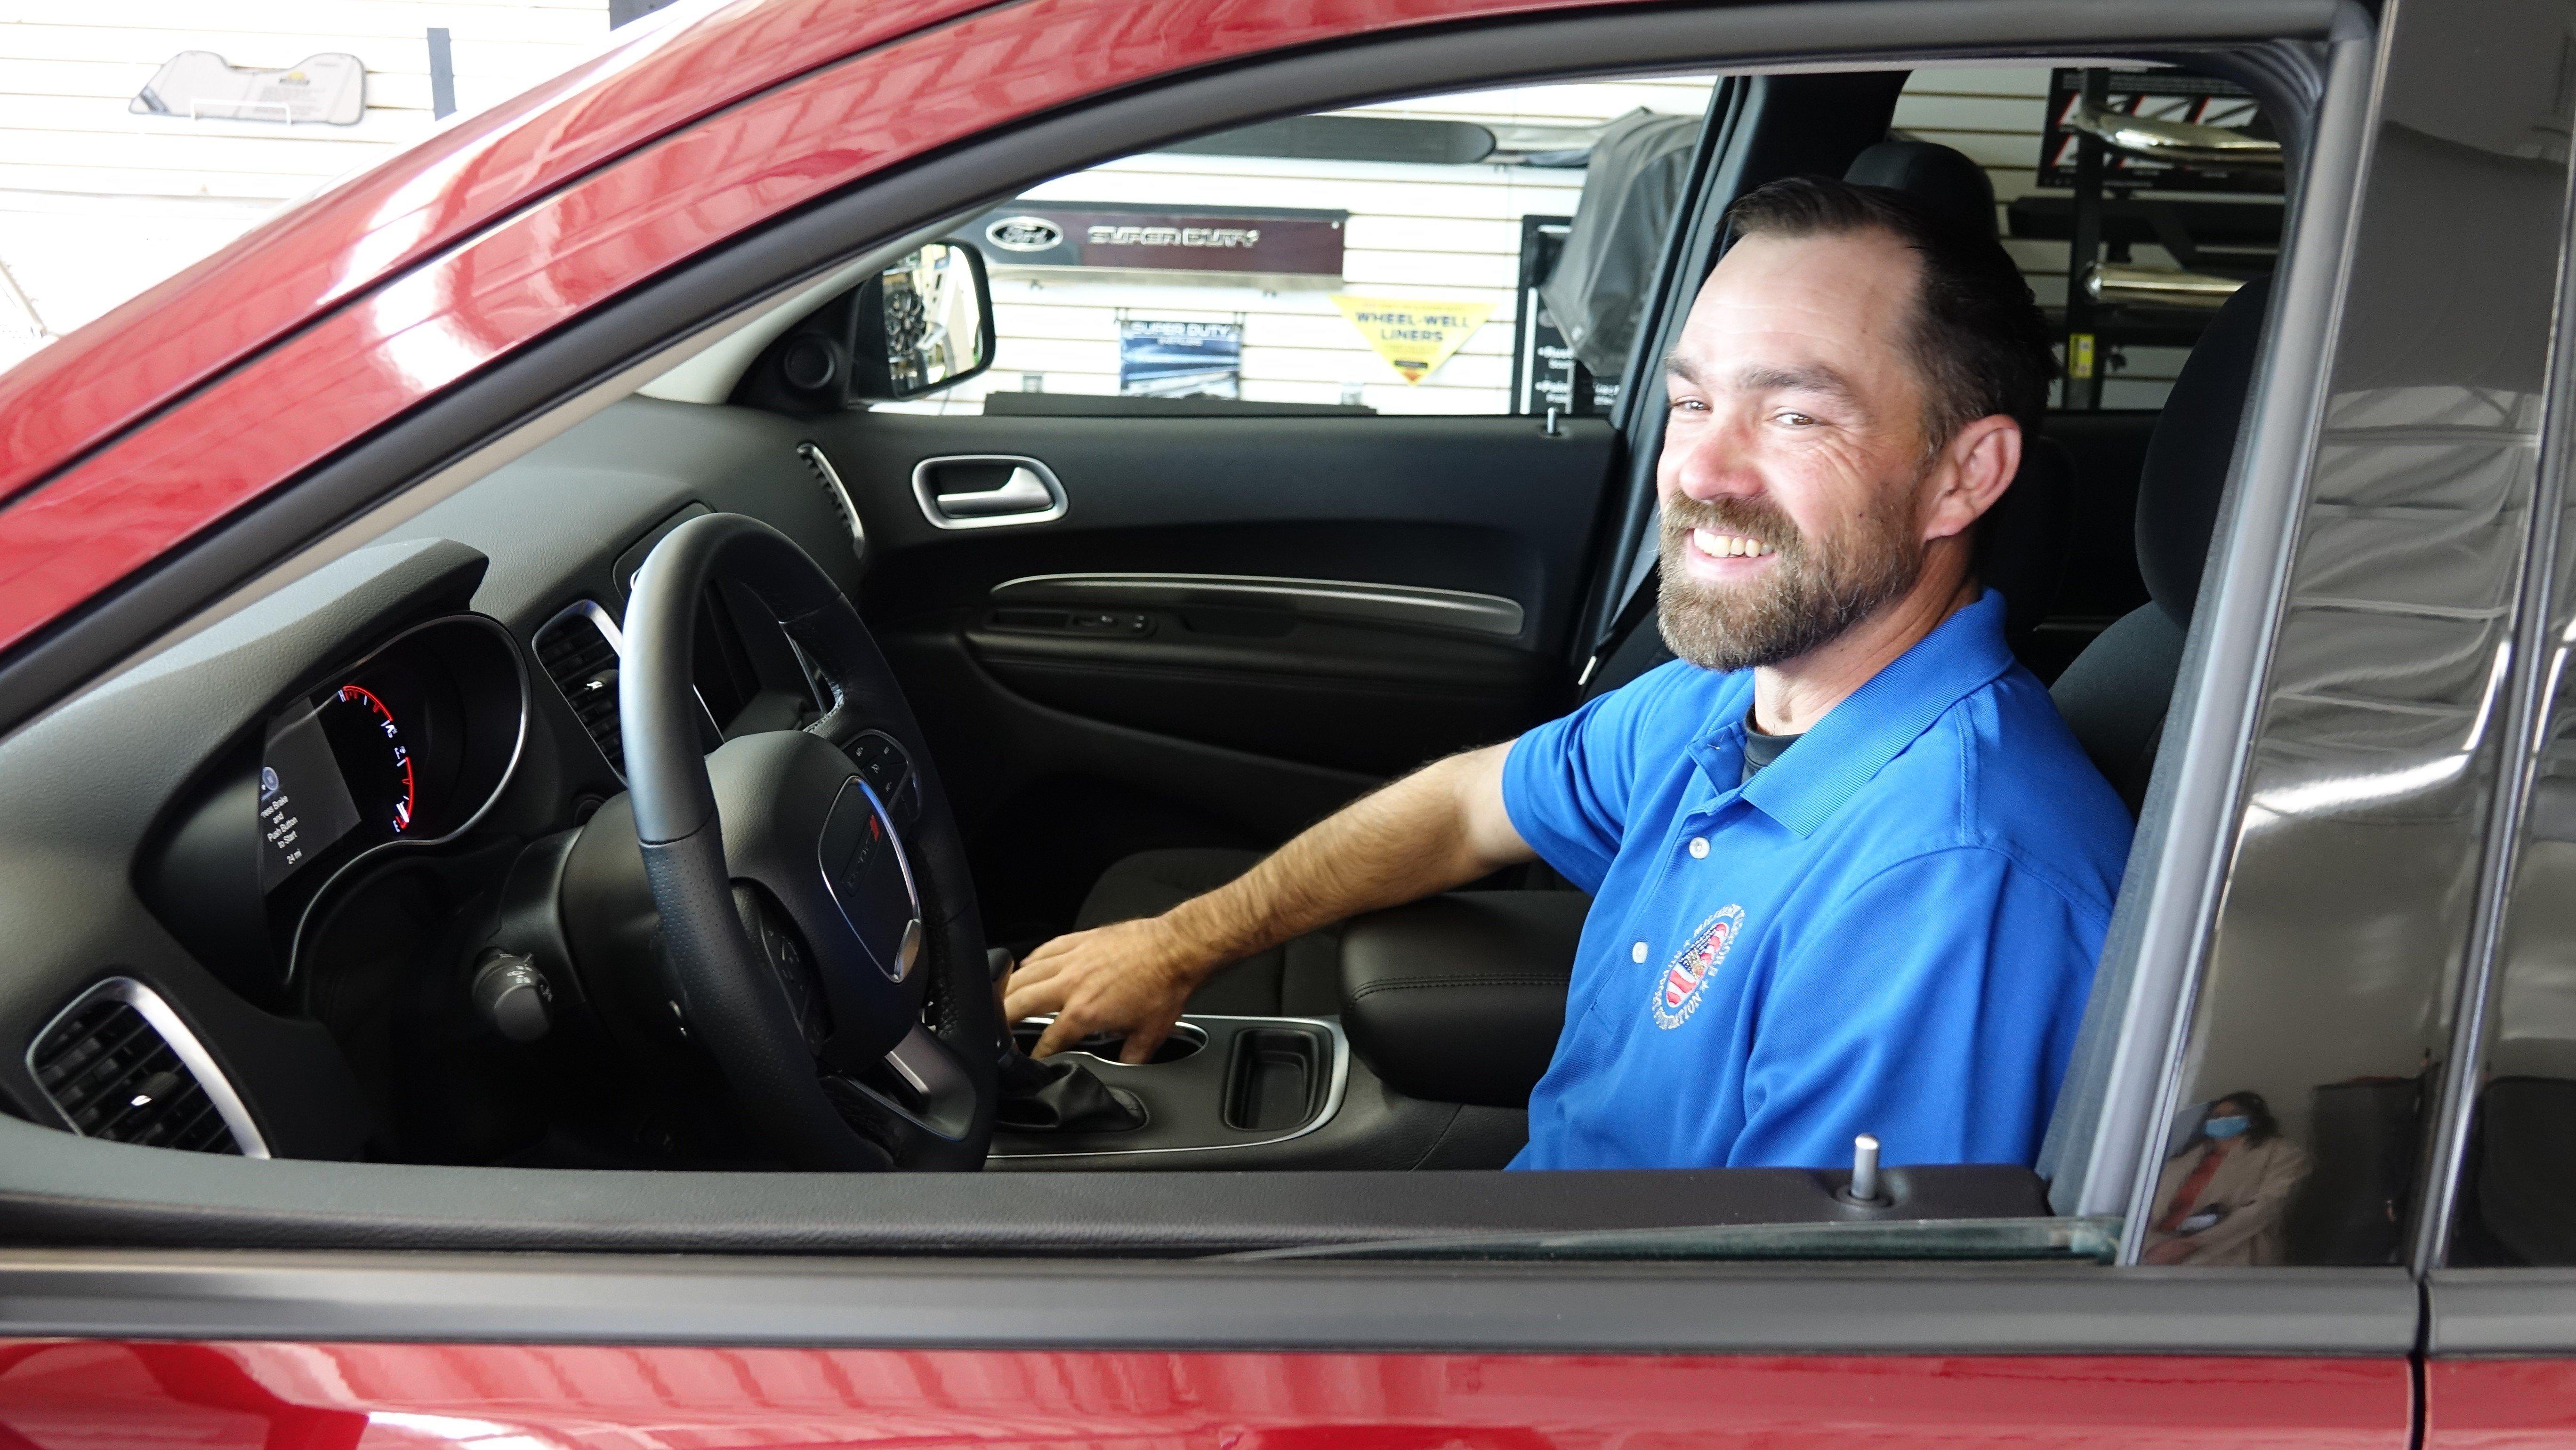 Clint Romesha in a new Dodge Durango